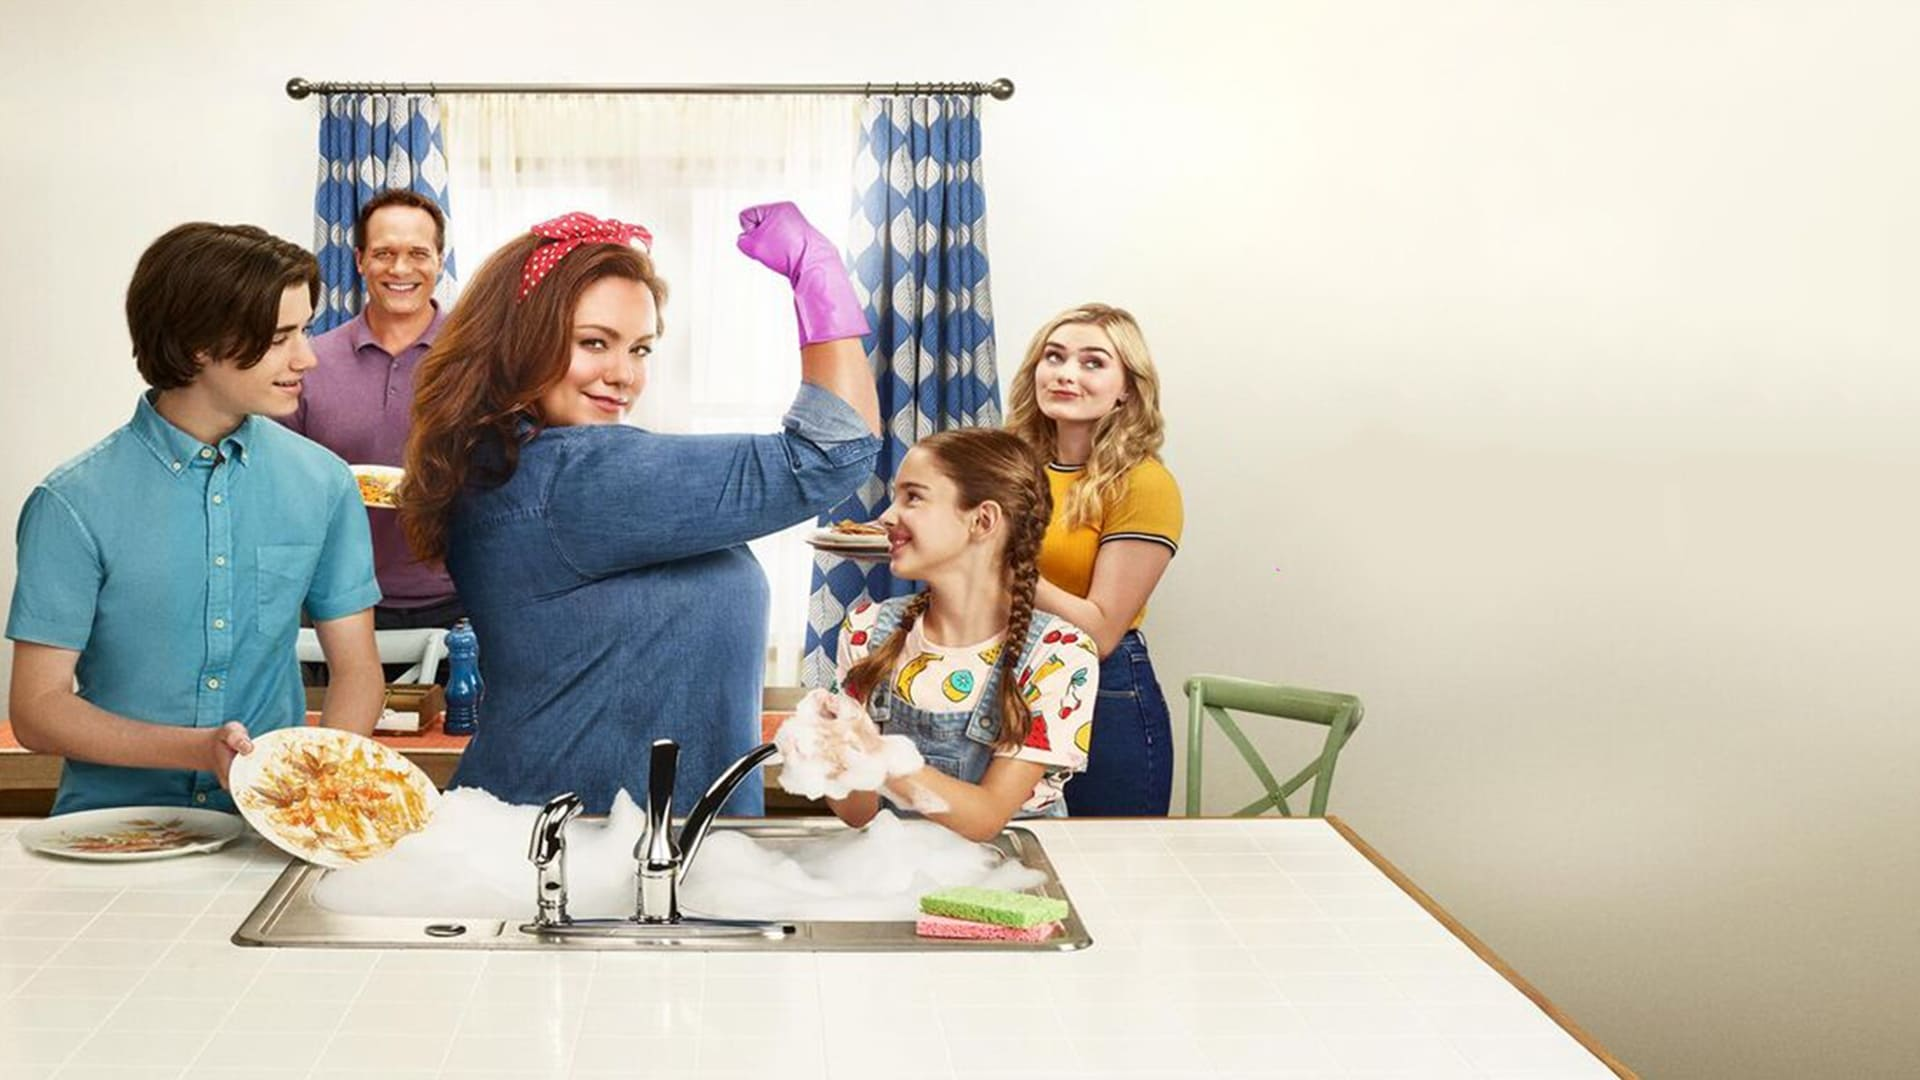 American Housewife - Season 4 Episode 12 : Wildflower Girls